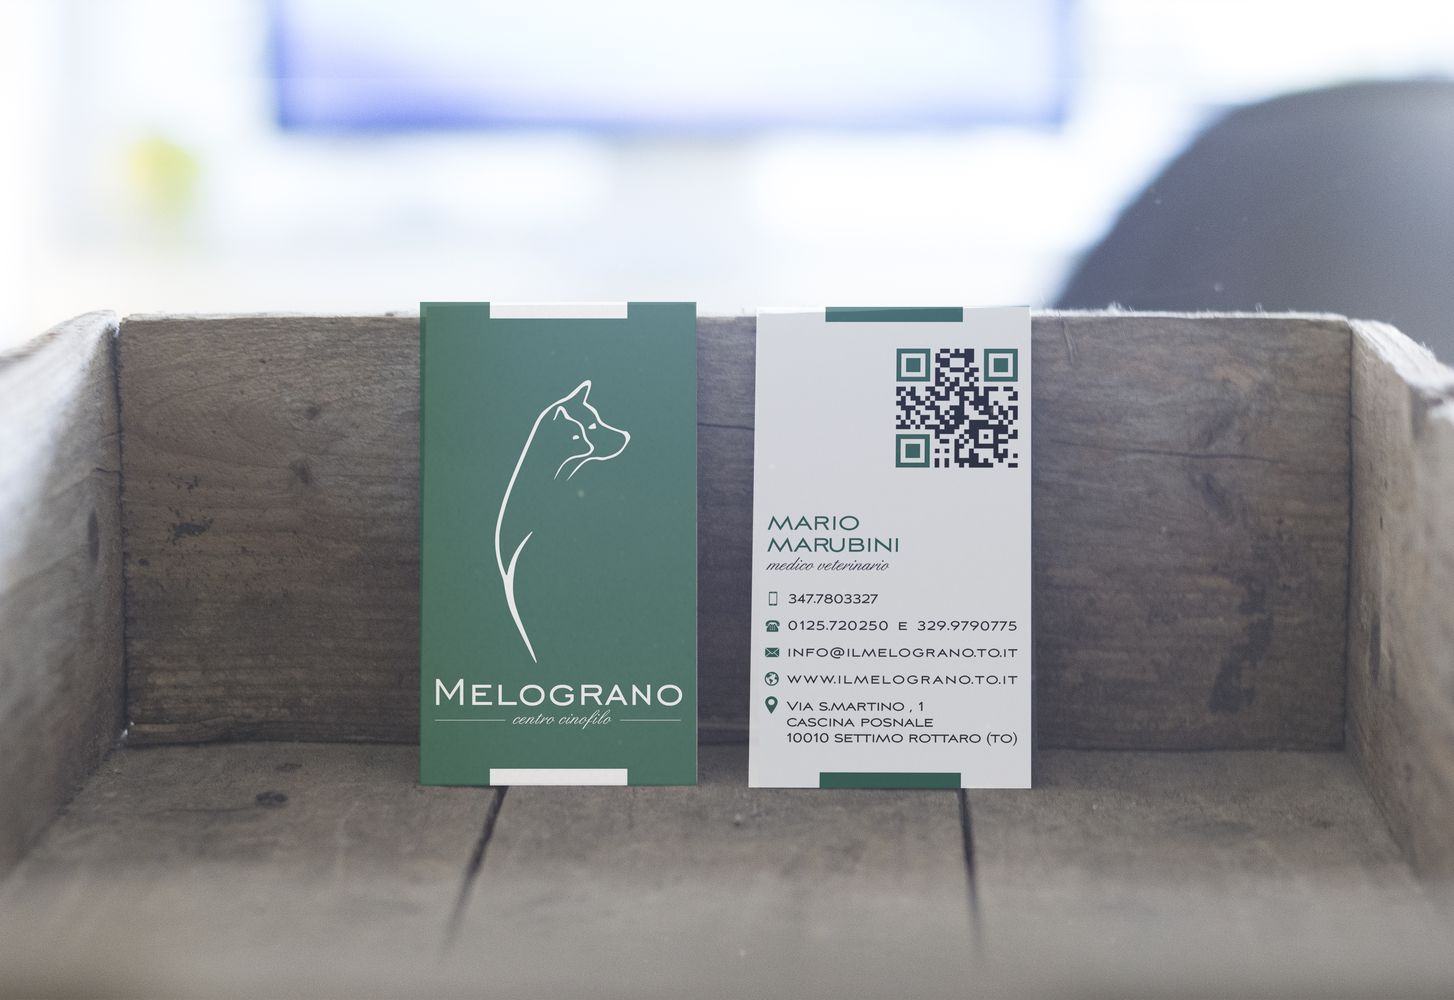 MELOGRANO_MockUp_01